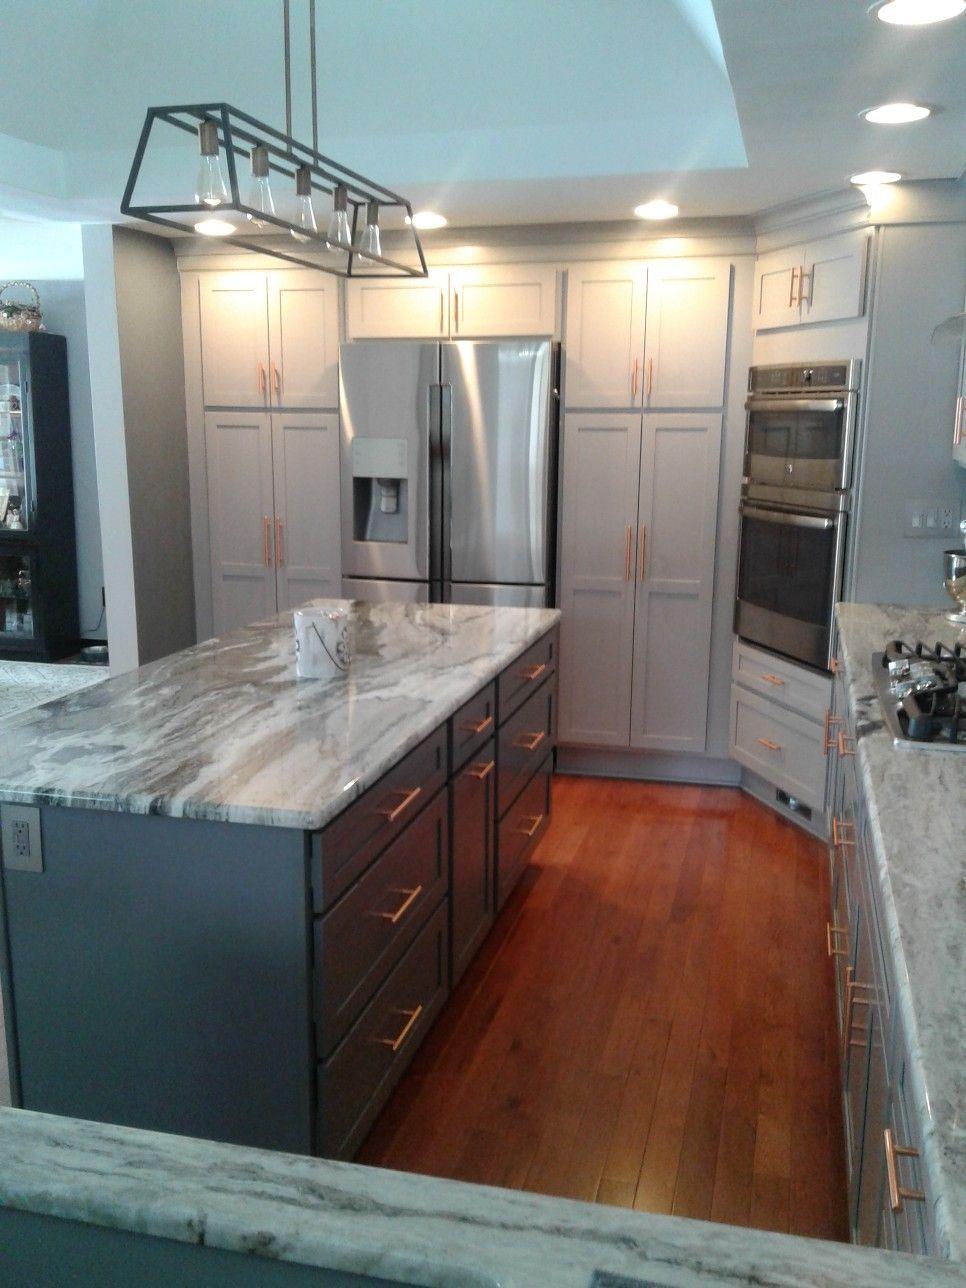 My Kitchen Reno Finally Done Kitchen Reno Kitchen Kitchen Cabinets